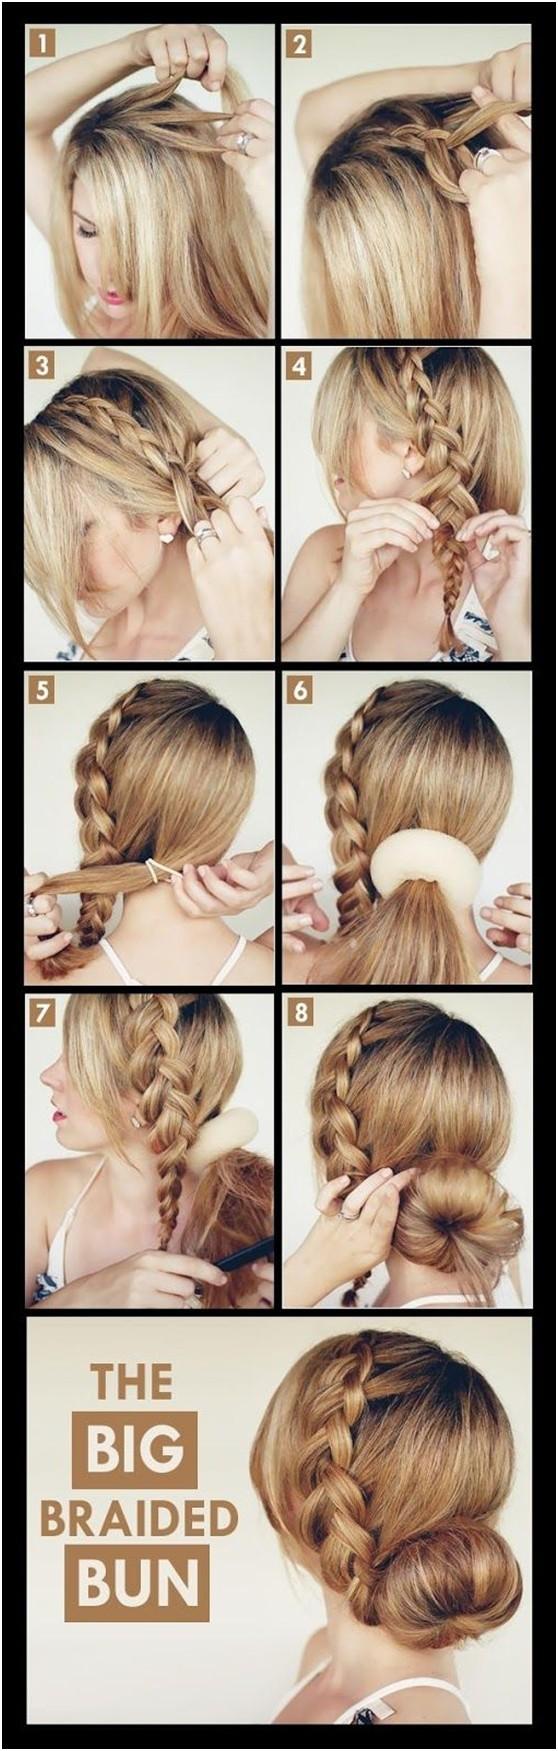 Amazing 15 Braided Updo Hairstyles Tutorials Pretty Designs Short Hairstyles Gunalazisus